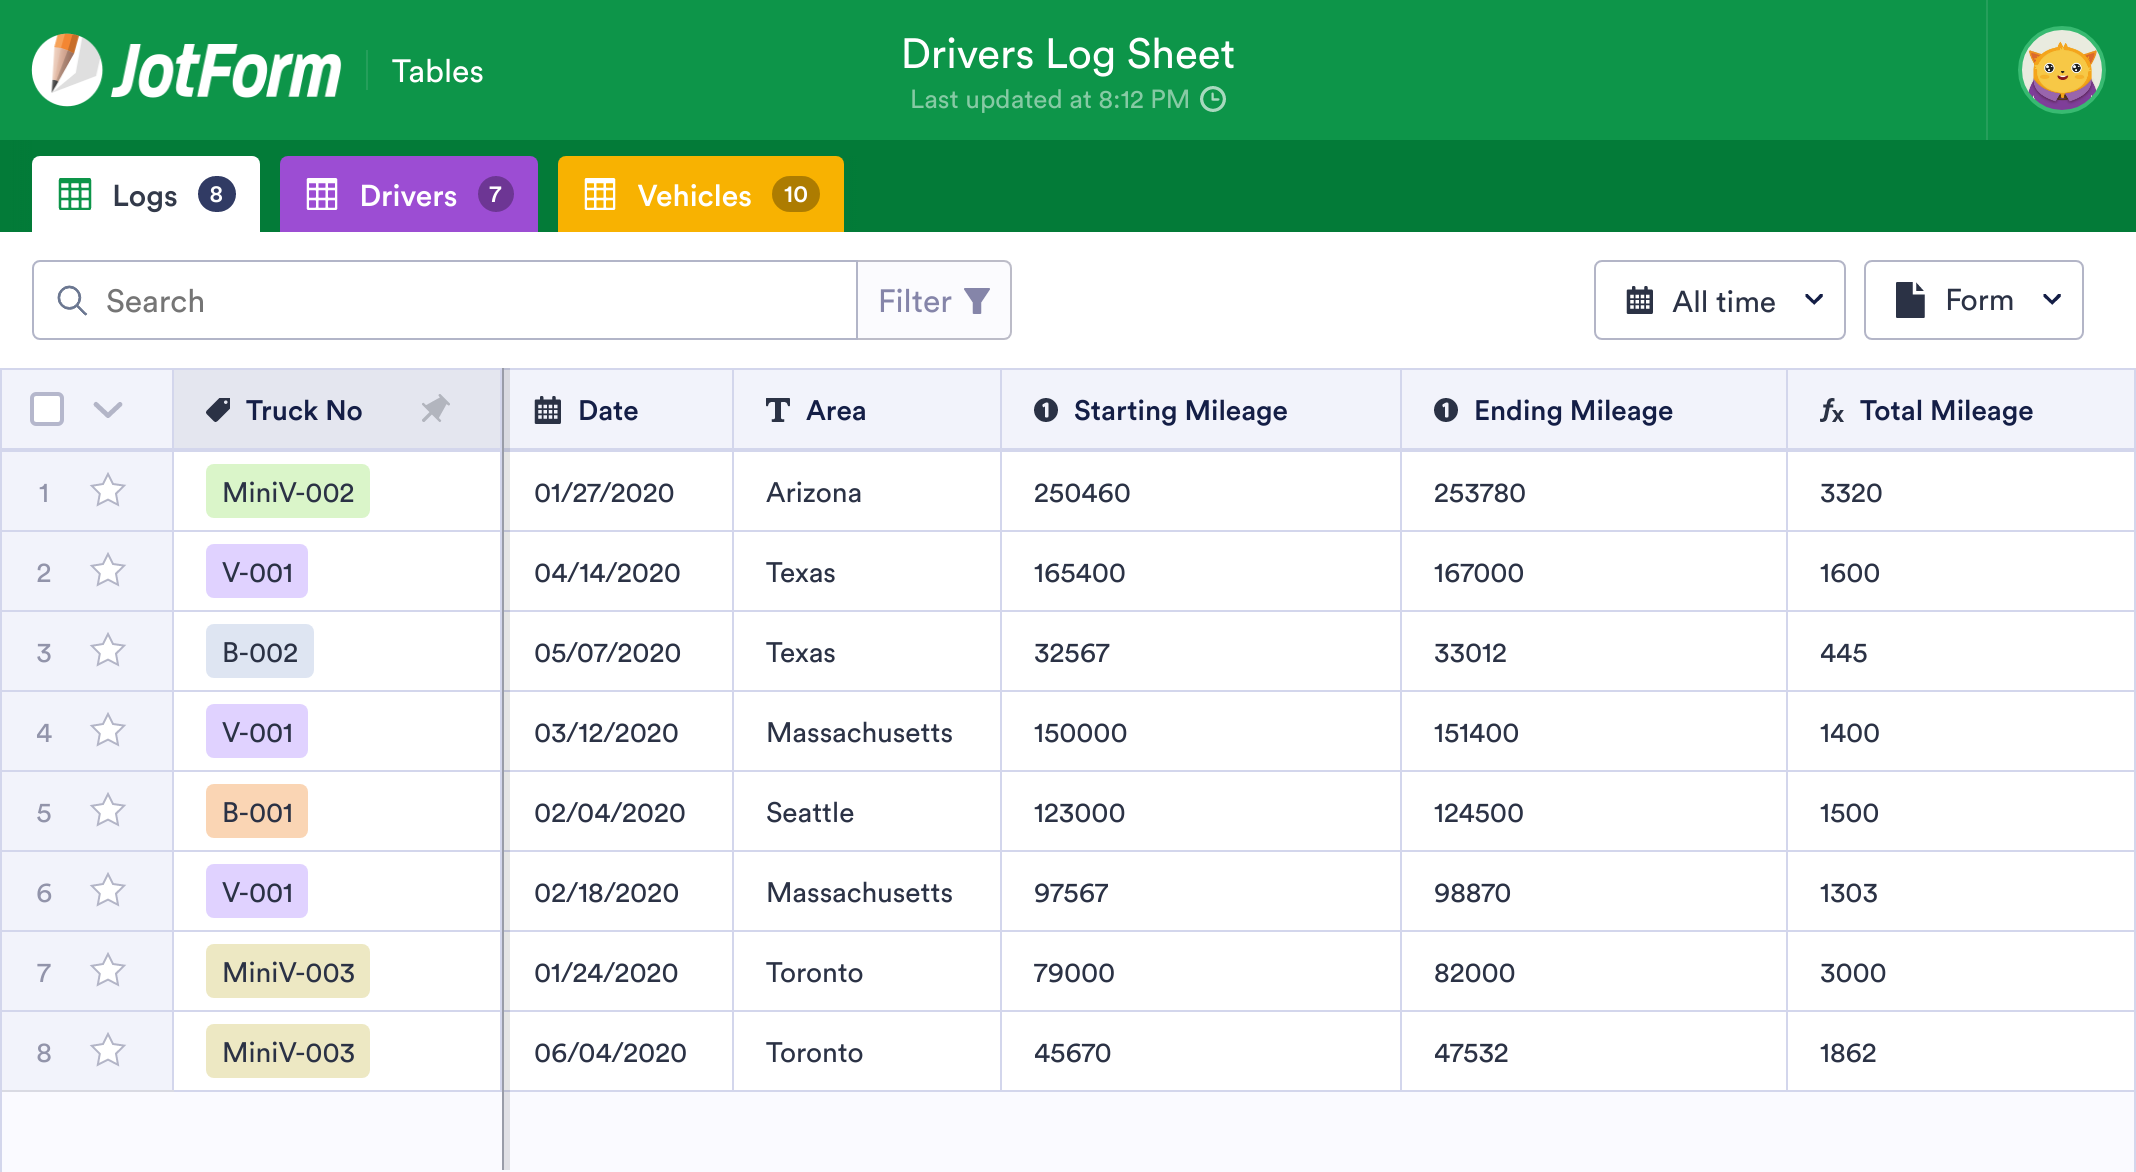 Drivers Log Sheet